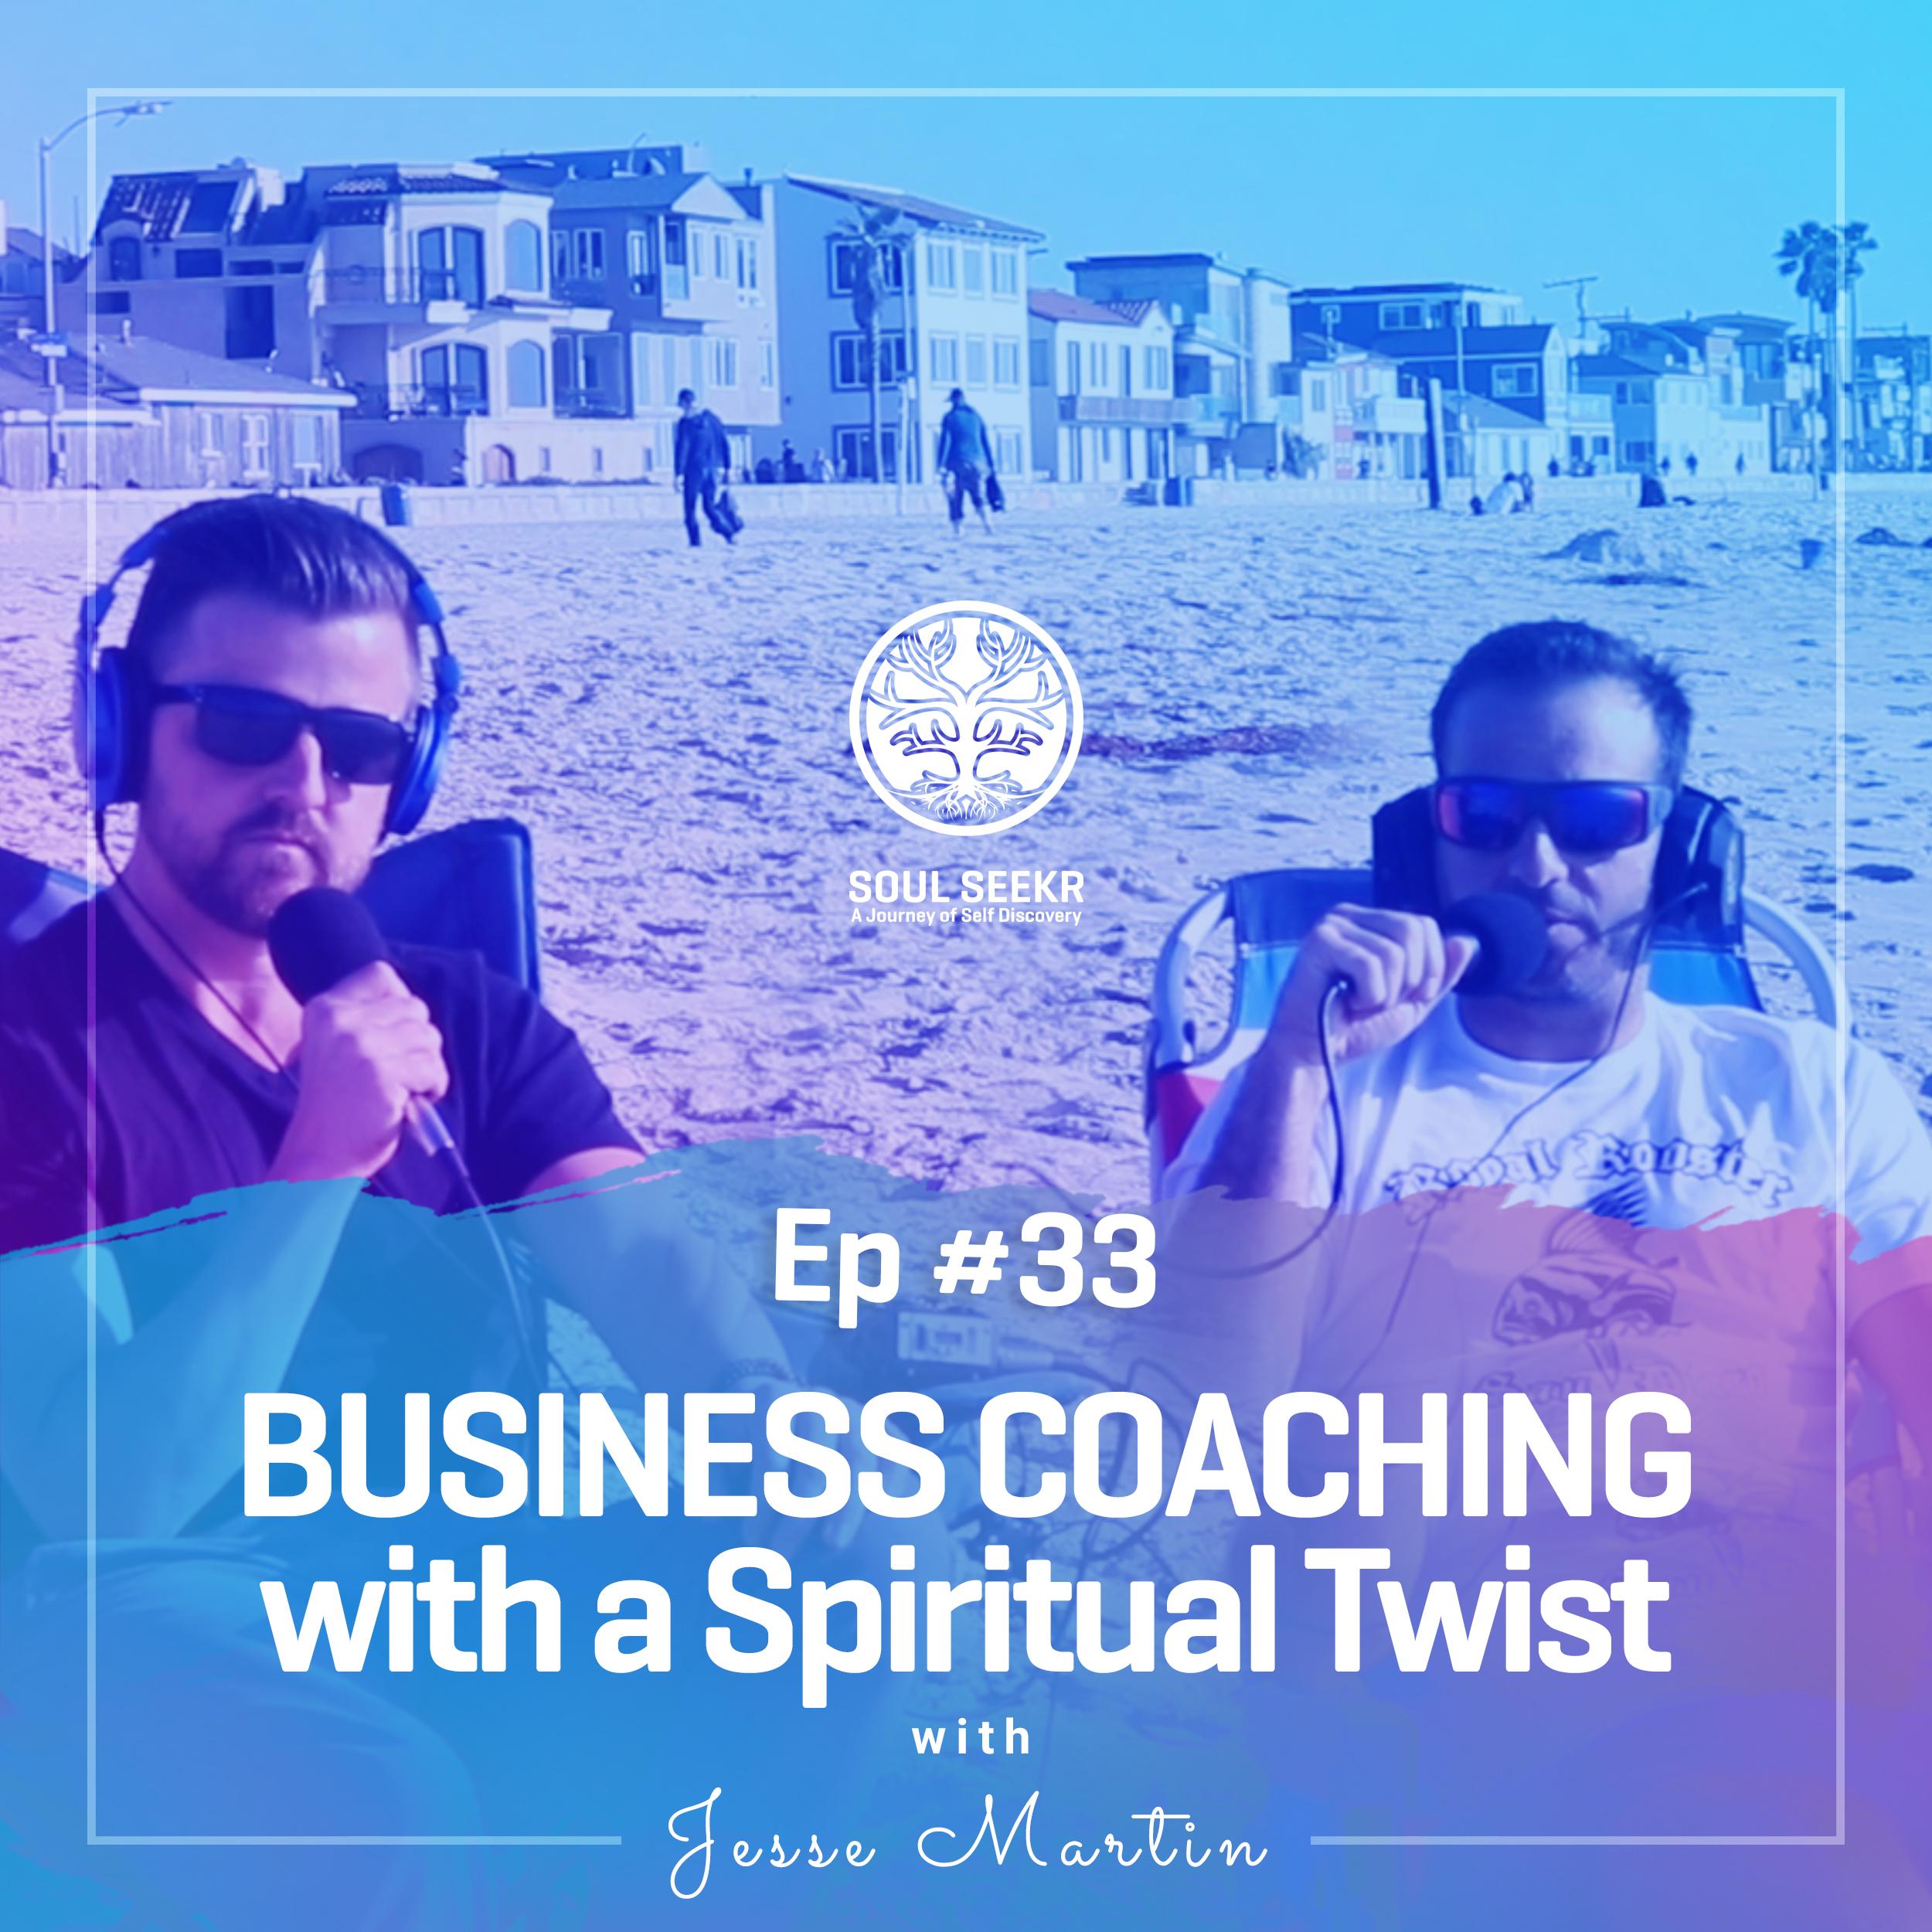 #33: Business Coaching with a Spiritual Twist w/ Jesse Martin